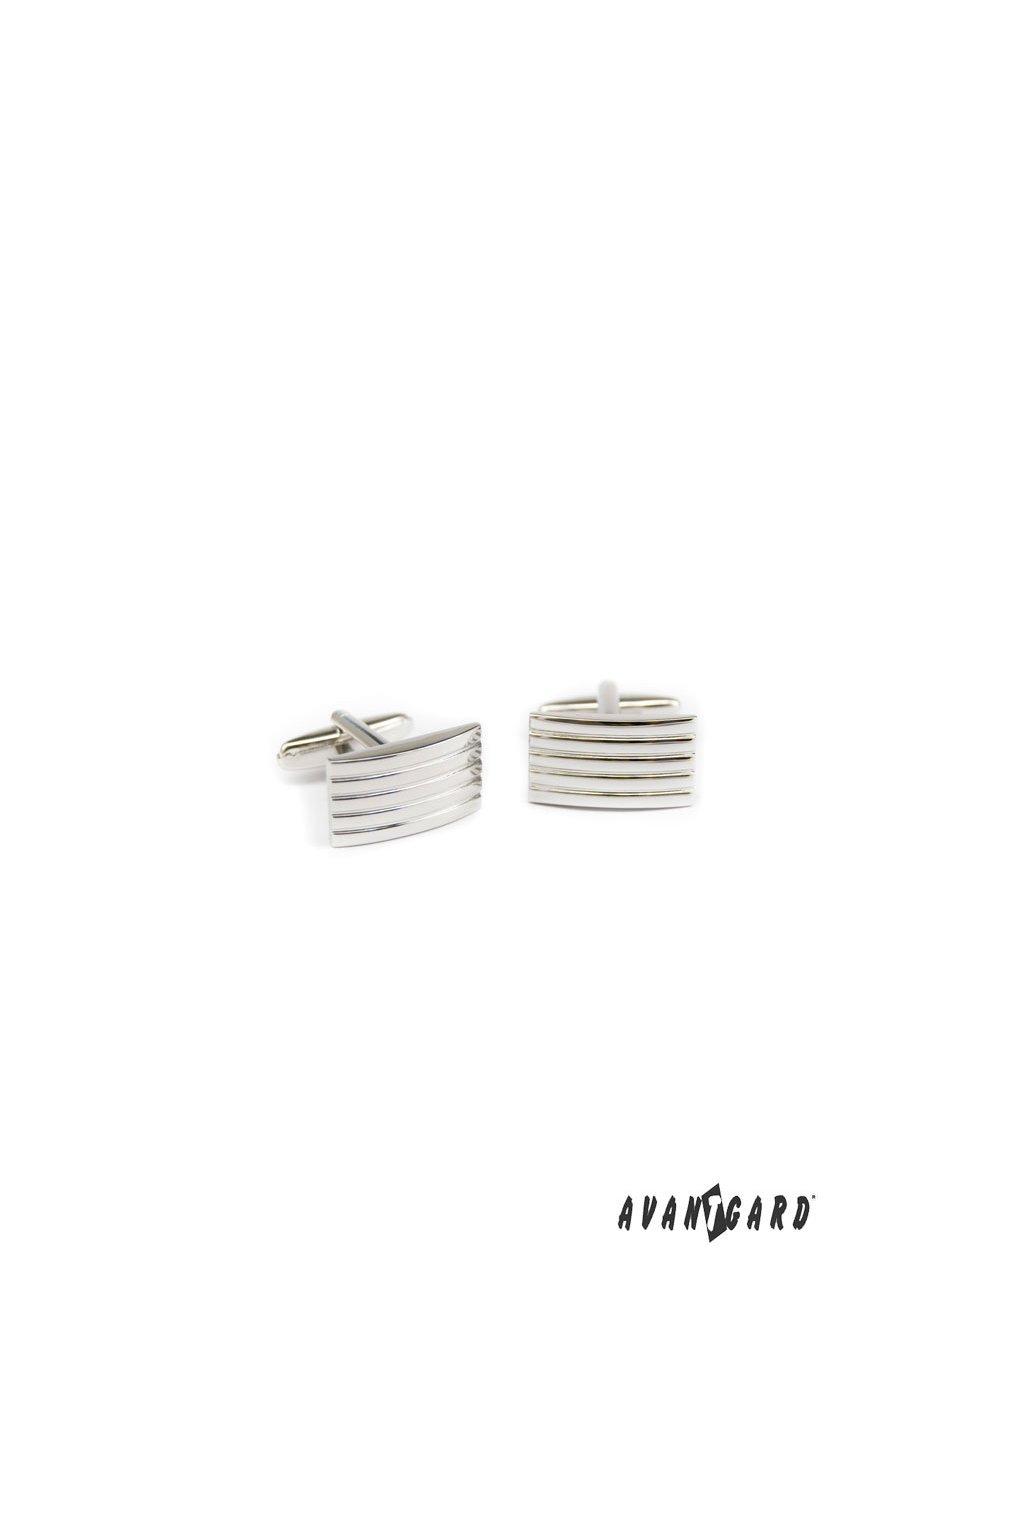 Manžetové knoflíčky AVANTGARD PREMIUM stříbrná lesk 573 - 20500